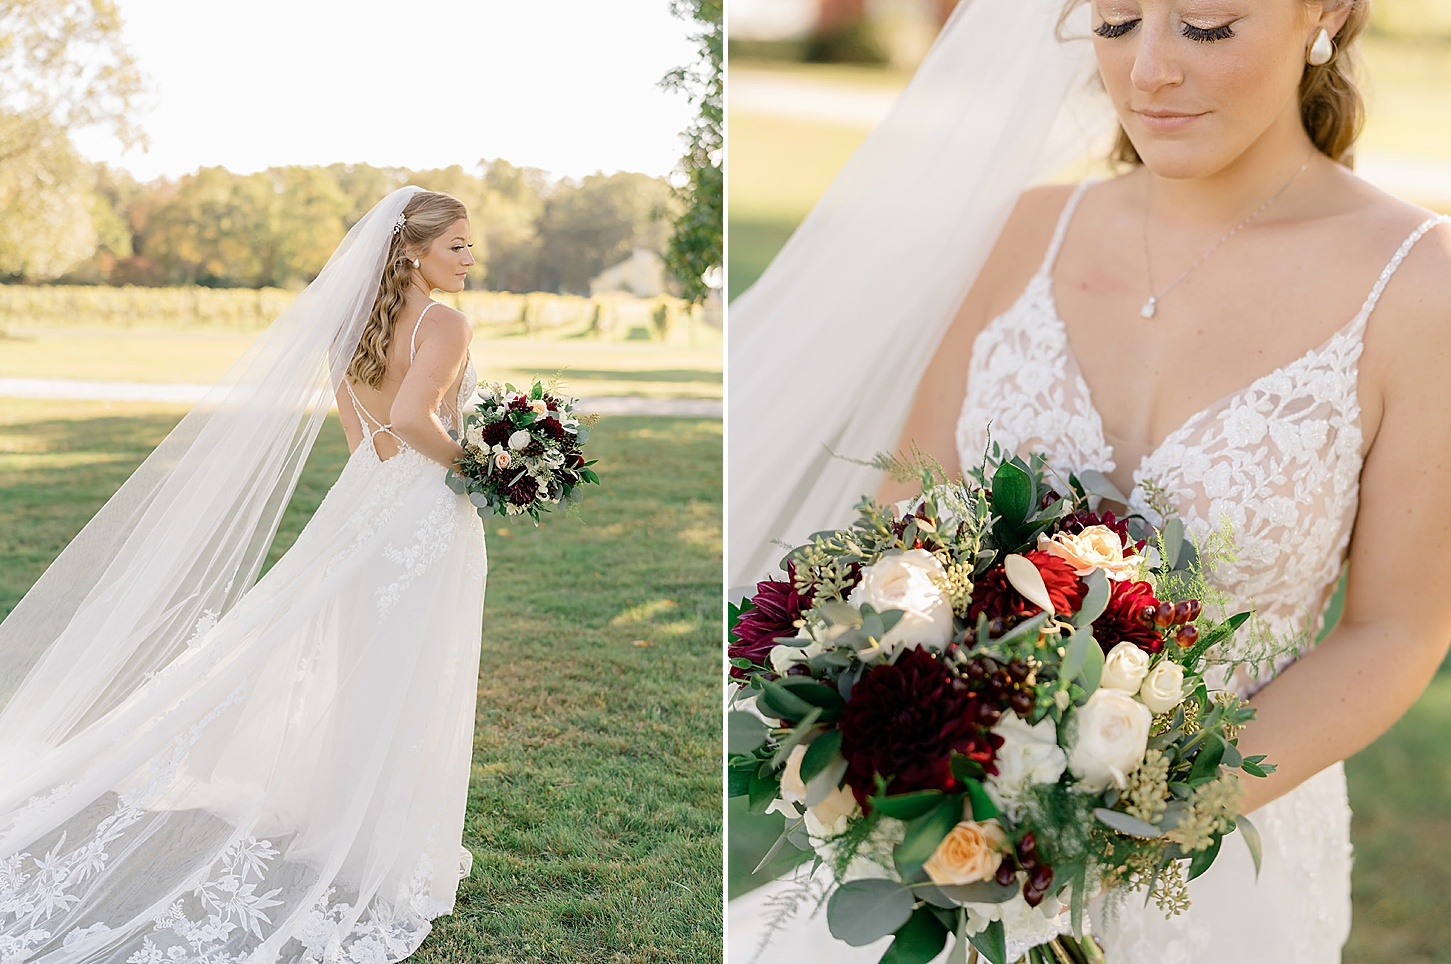 Valenzano Winery Vitners Pavillion Wedding Photography by Magdalena Studios 0006